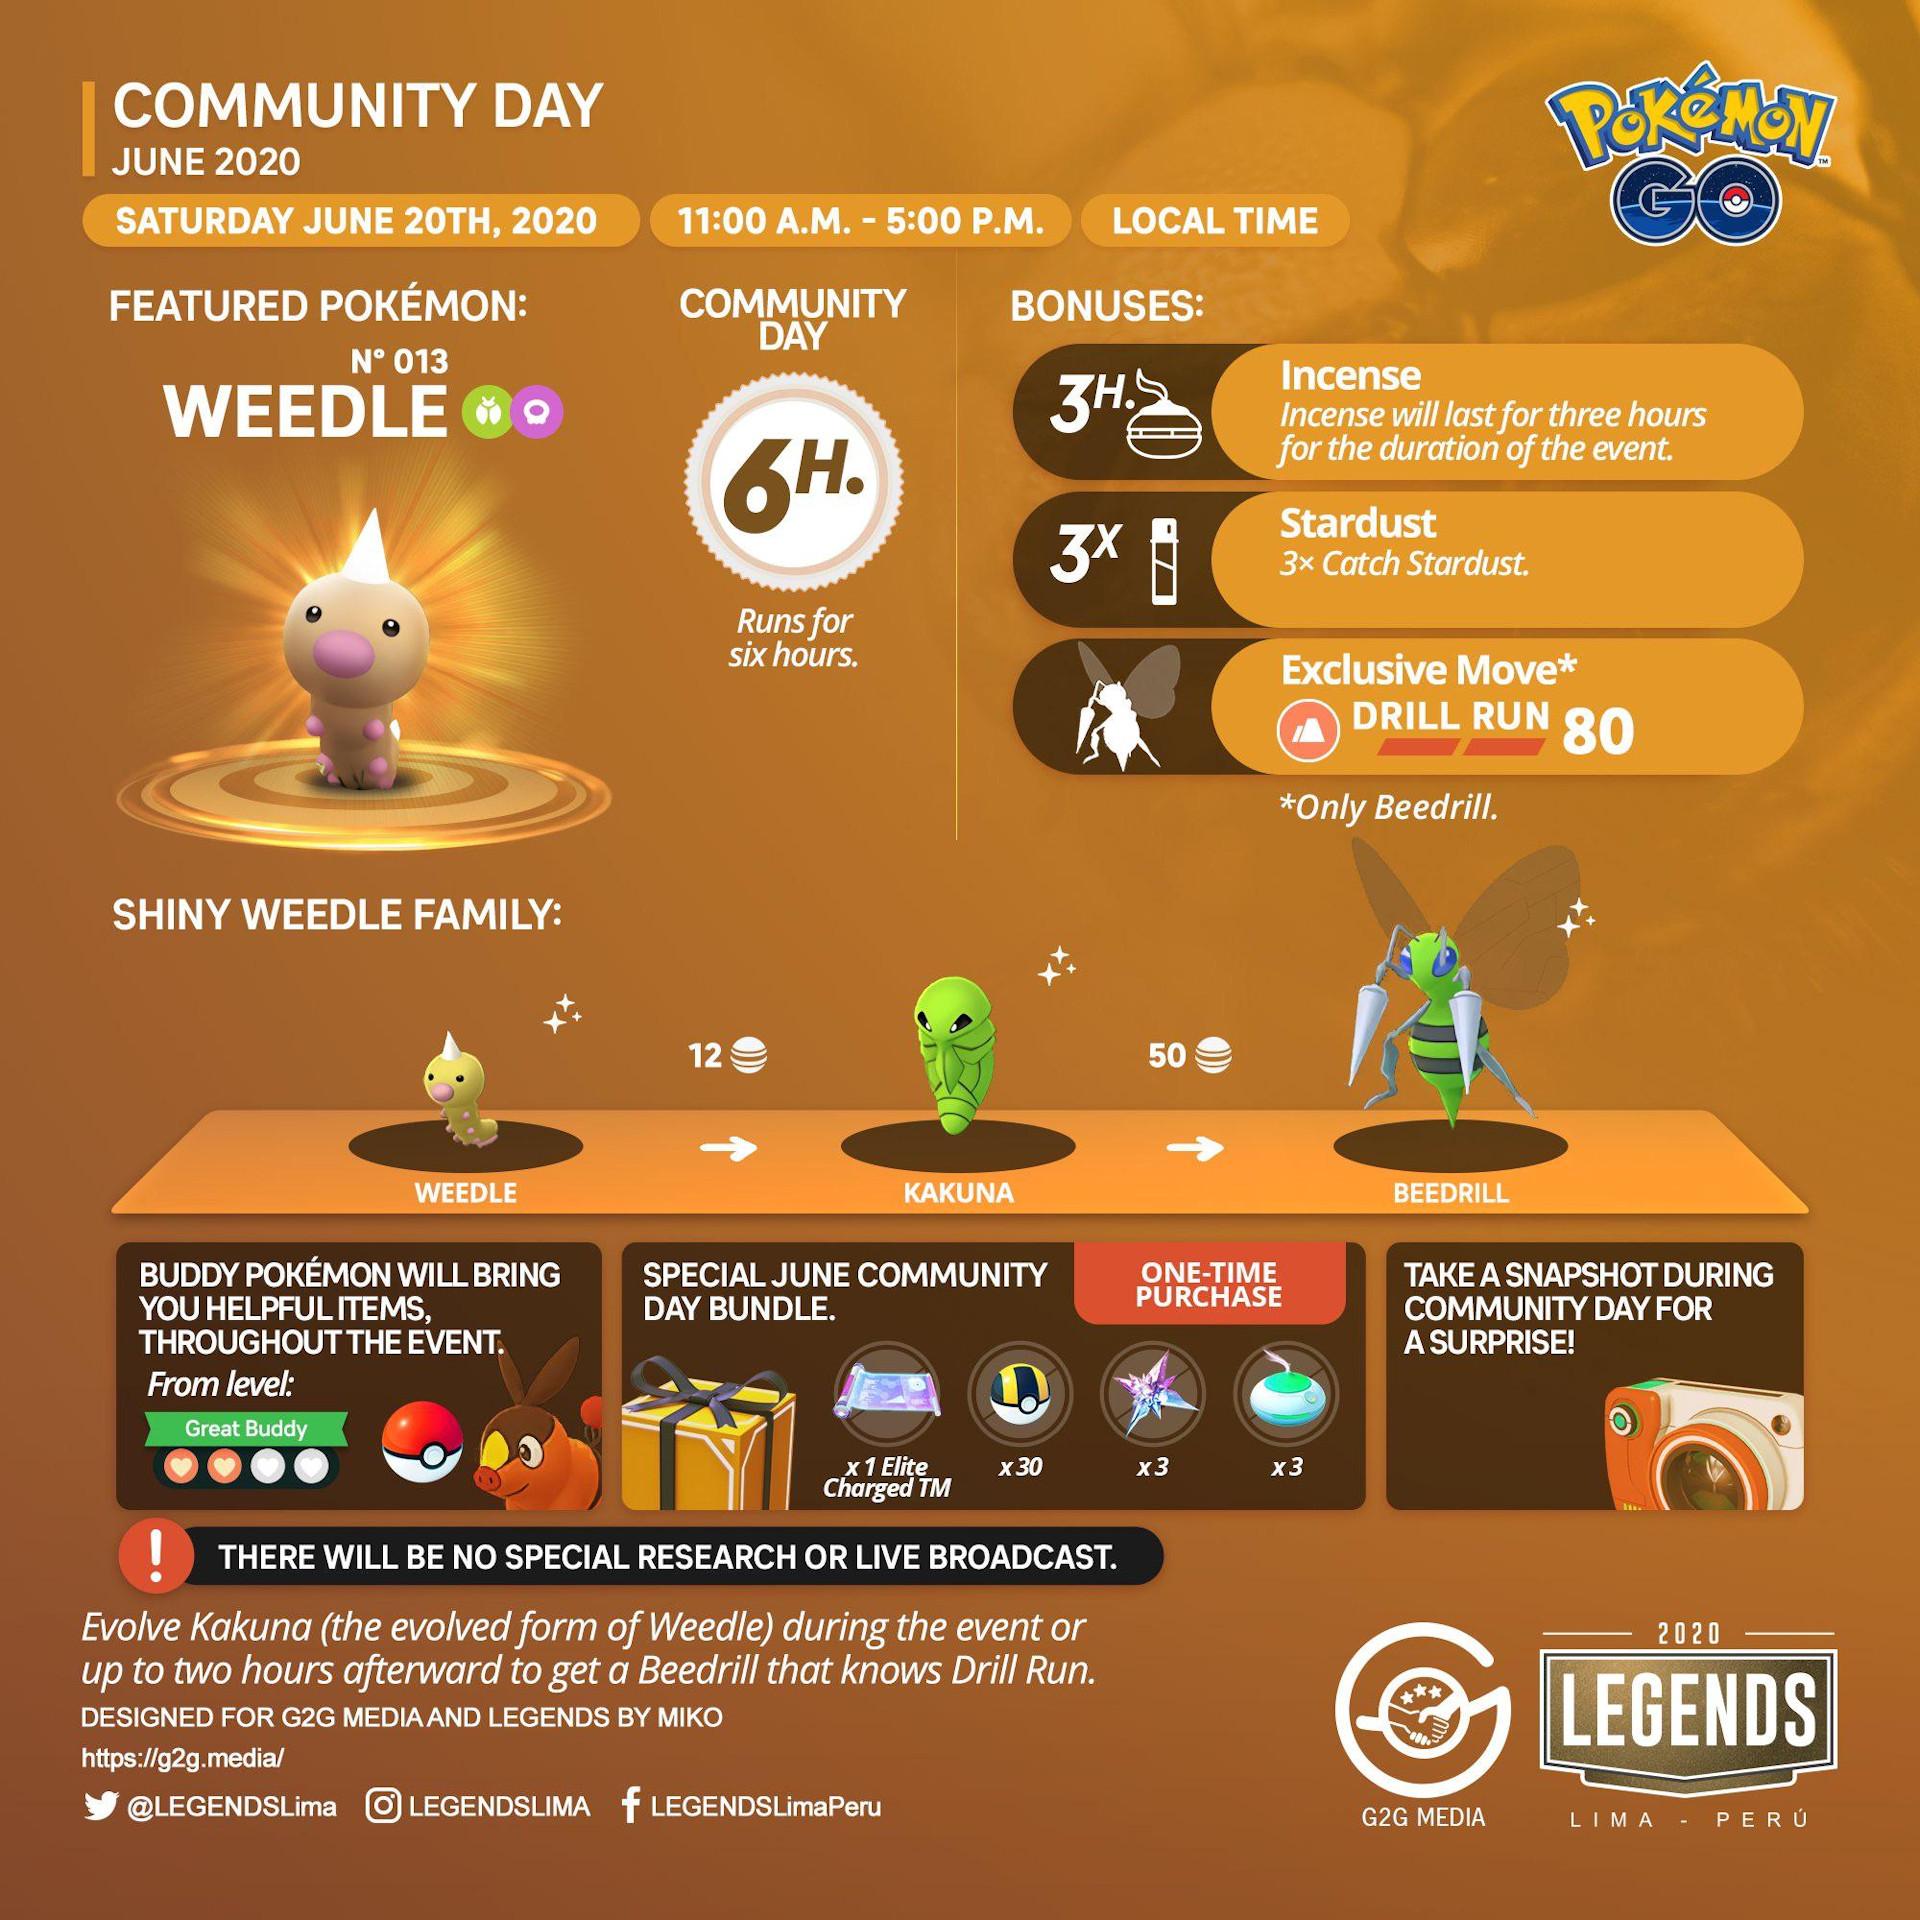 Pokemon Go June 2020 Community Day Cheat Sheet